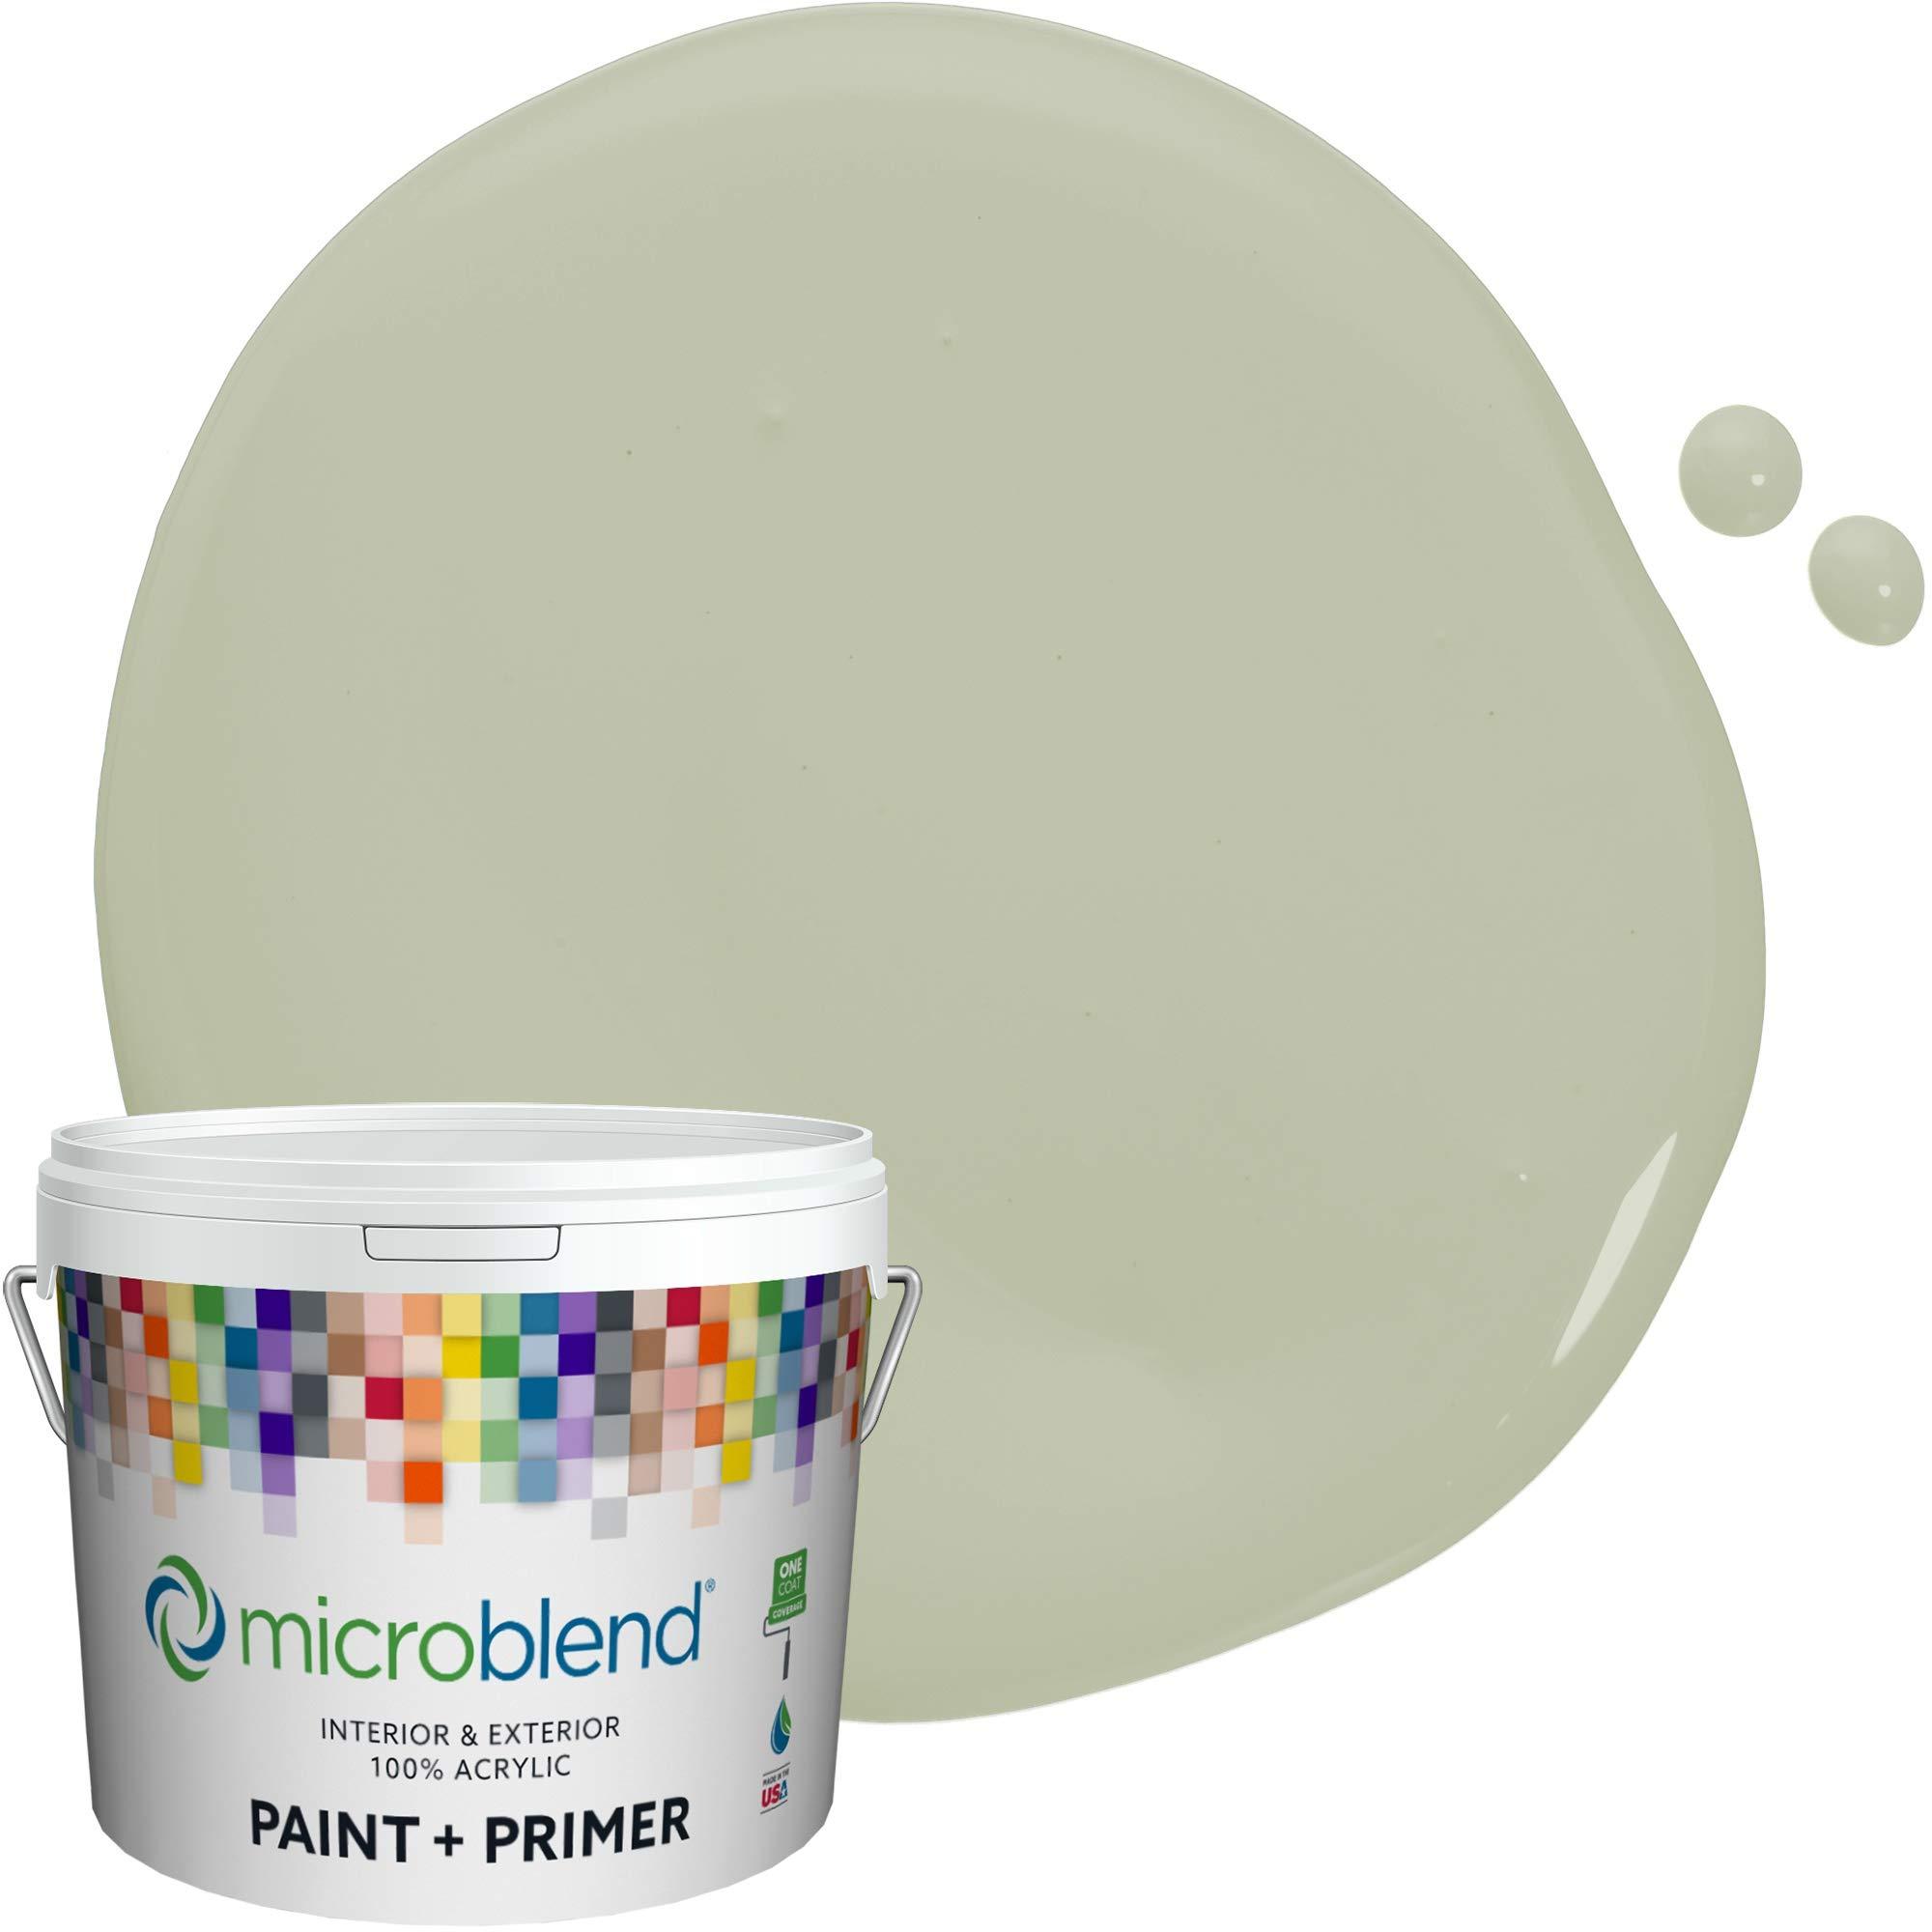 Microblend Exterior Paint + Primer, Slight Celery, Eggshell Sheen, 1 Gallon, Custom Made, Premium Quality One Coat Hide & Washable Paint (74221-2-M1544B2)